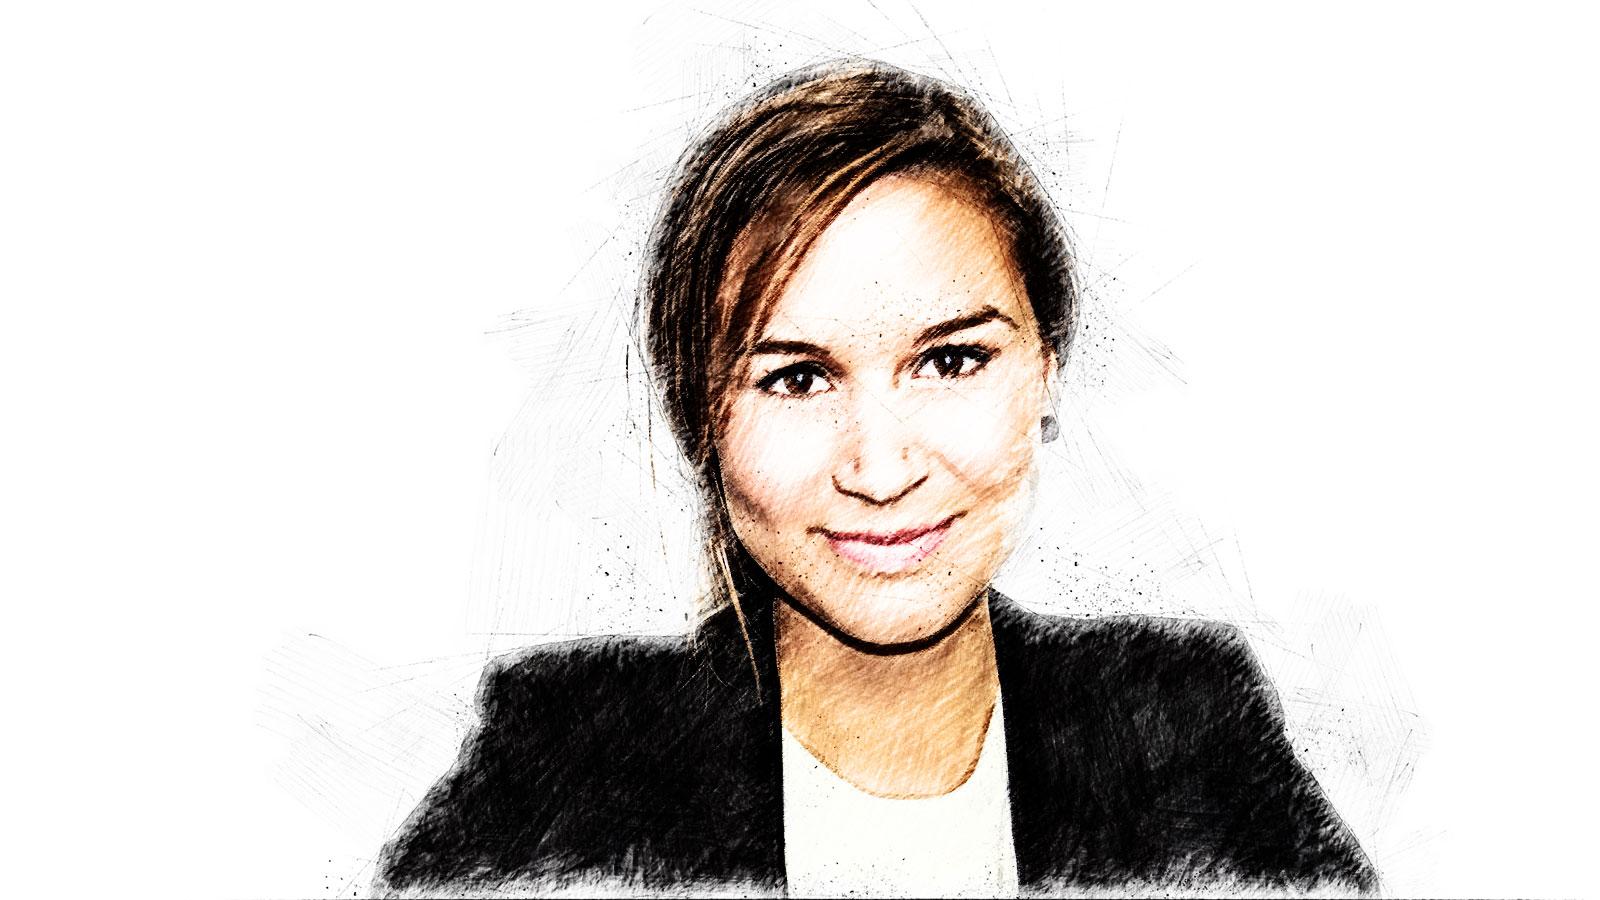 Bellinda Bartolucci, Pro Asyl, Flüchtlinge, Flüchtlingspolitik, Asyl